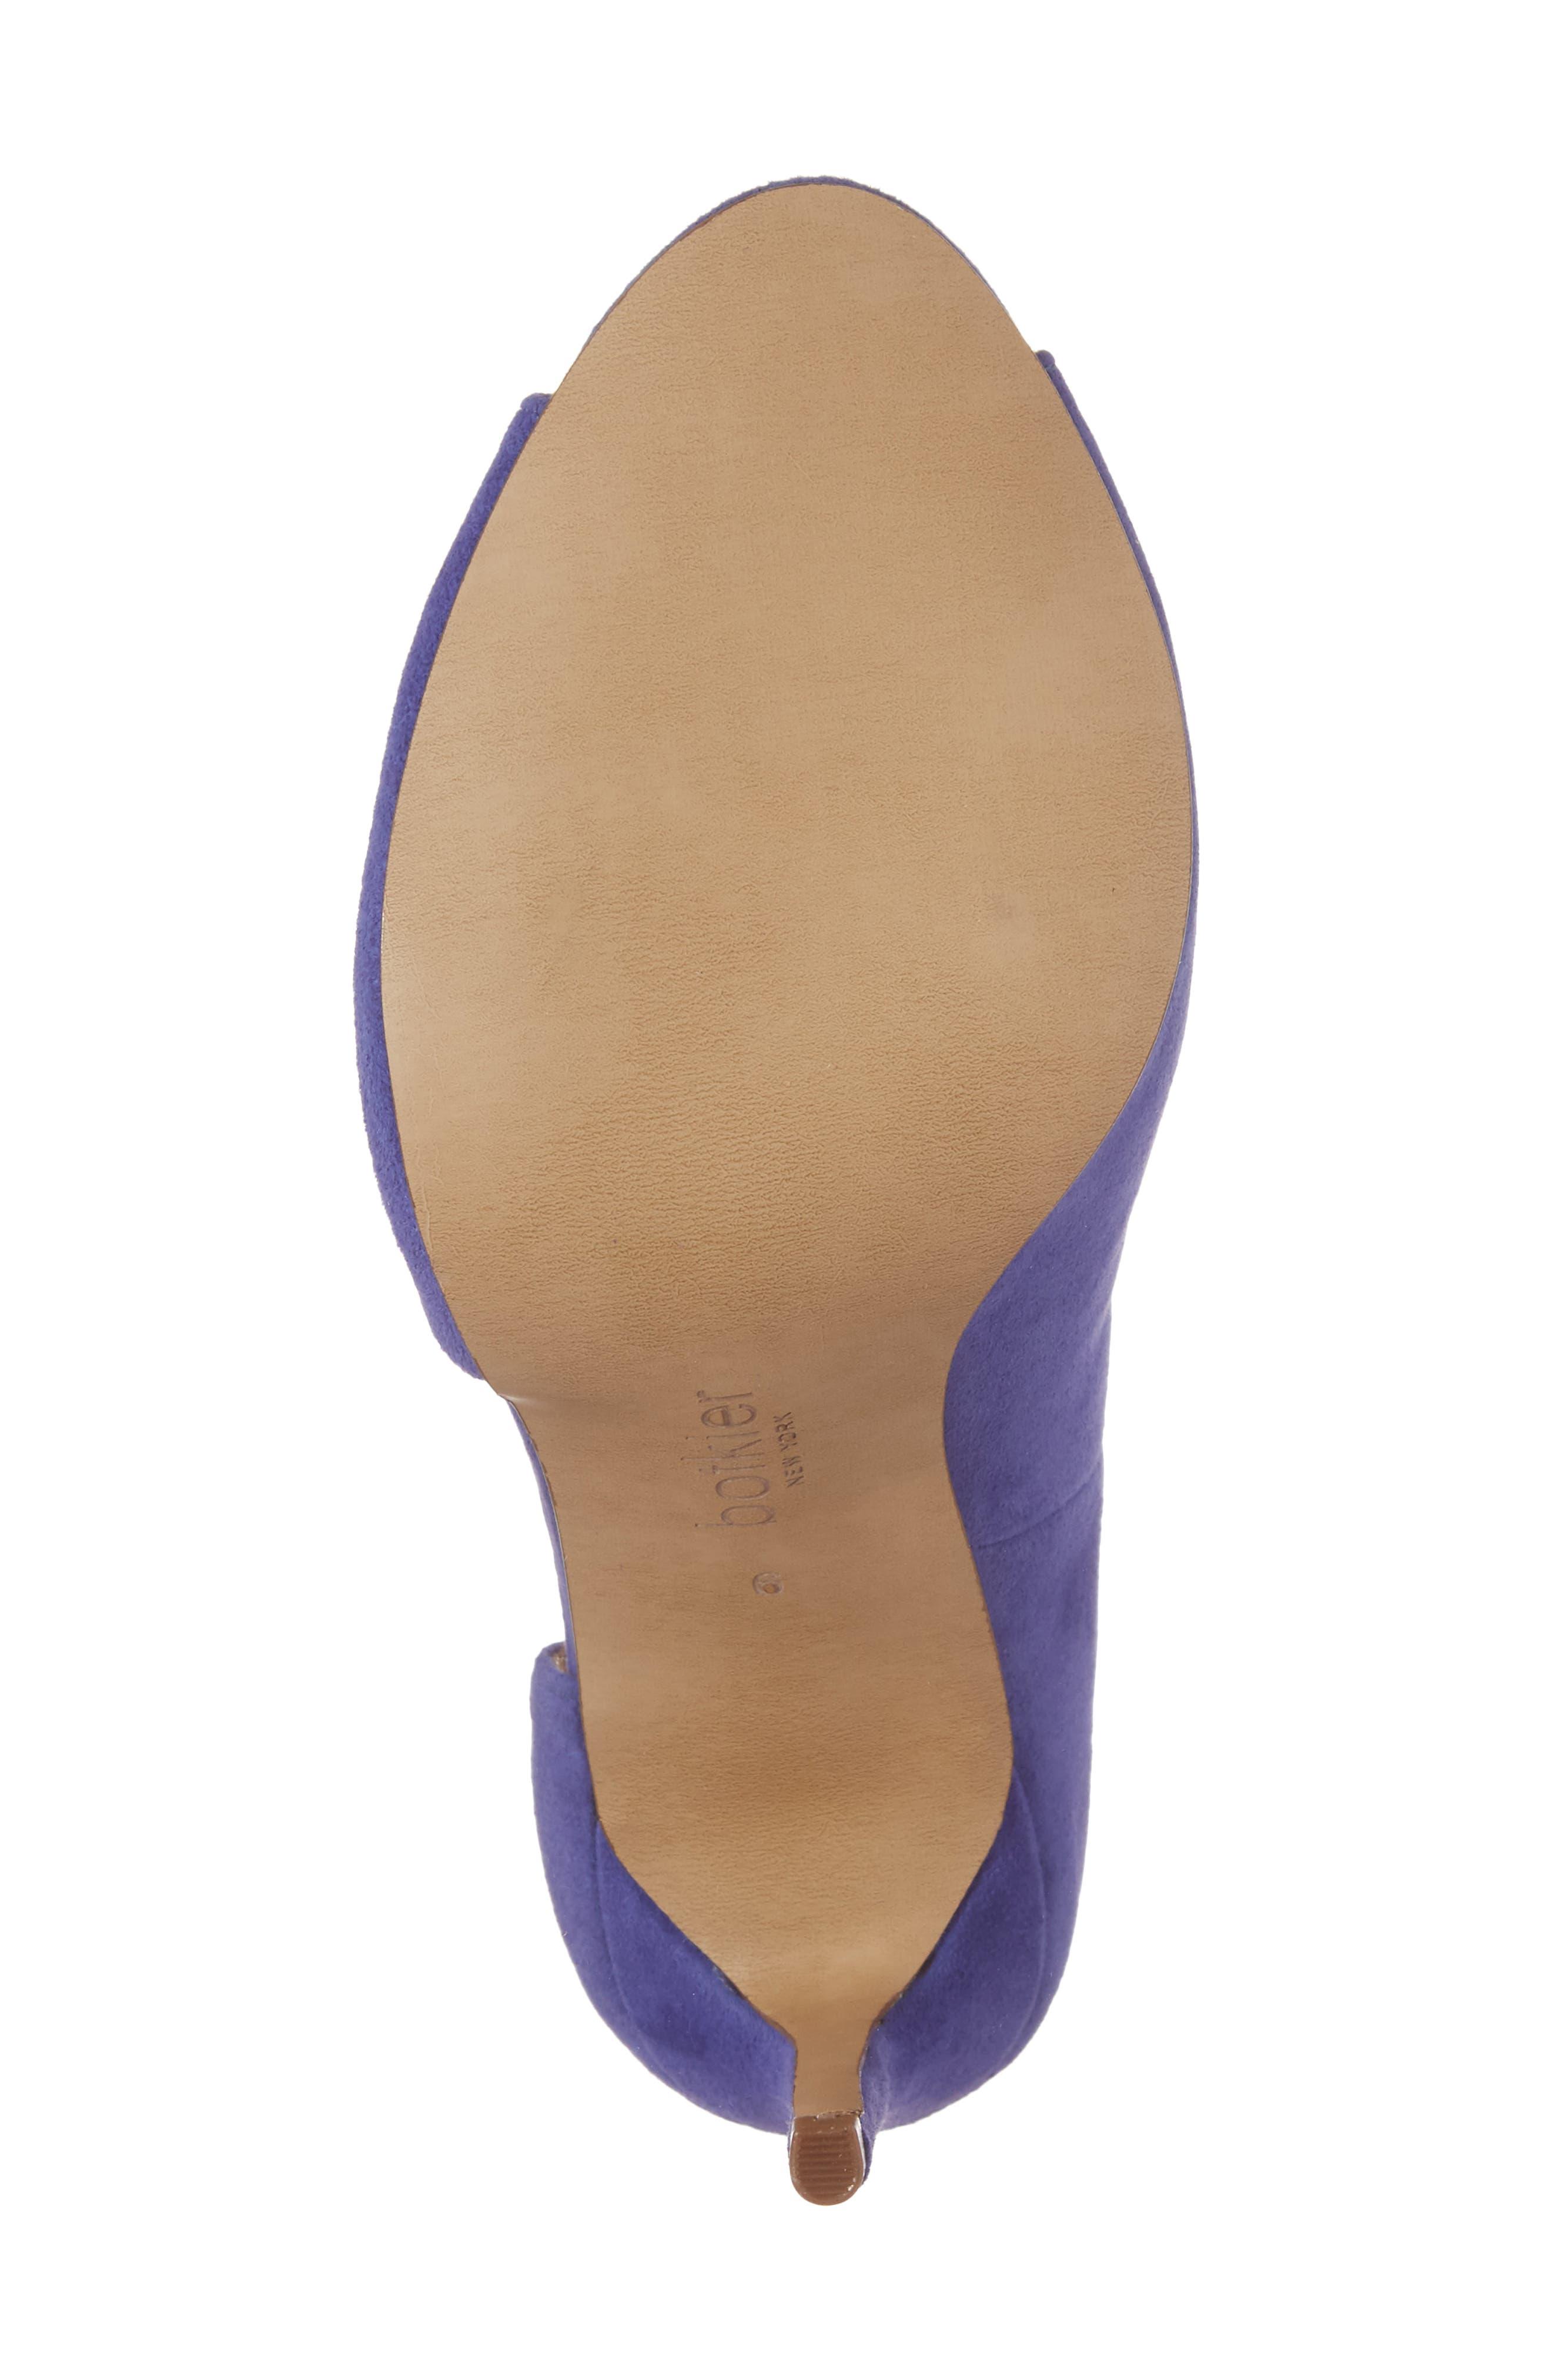 Adelia Asymmetrical Sandal,                             Alternate thumbnail 6, color,                             Blue